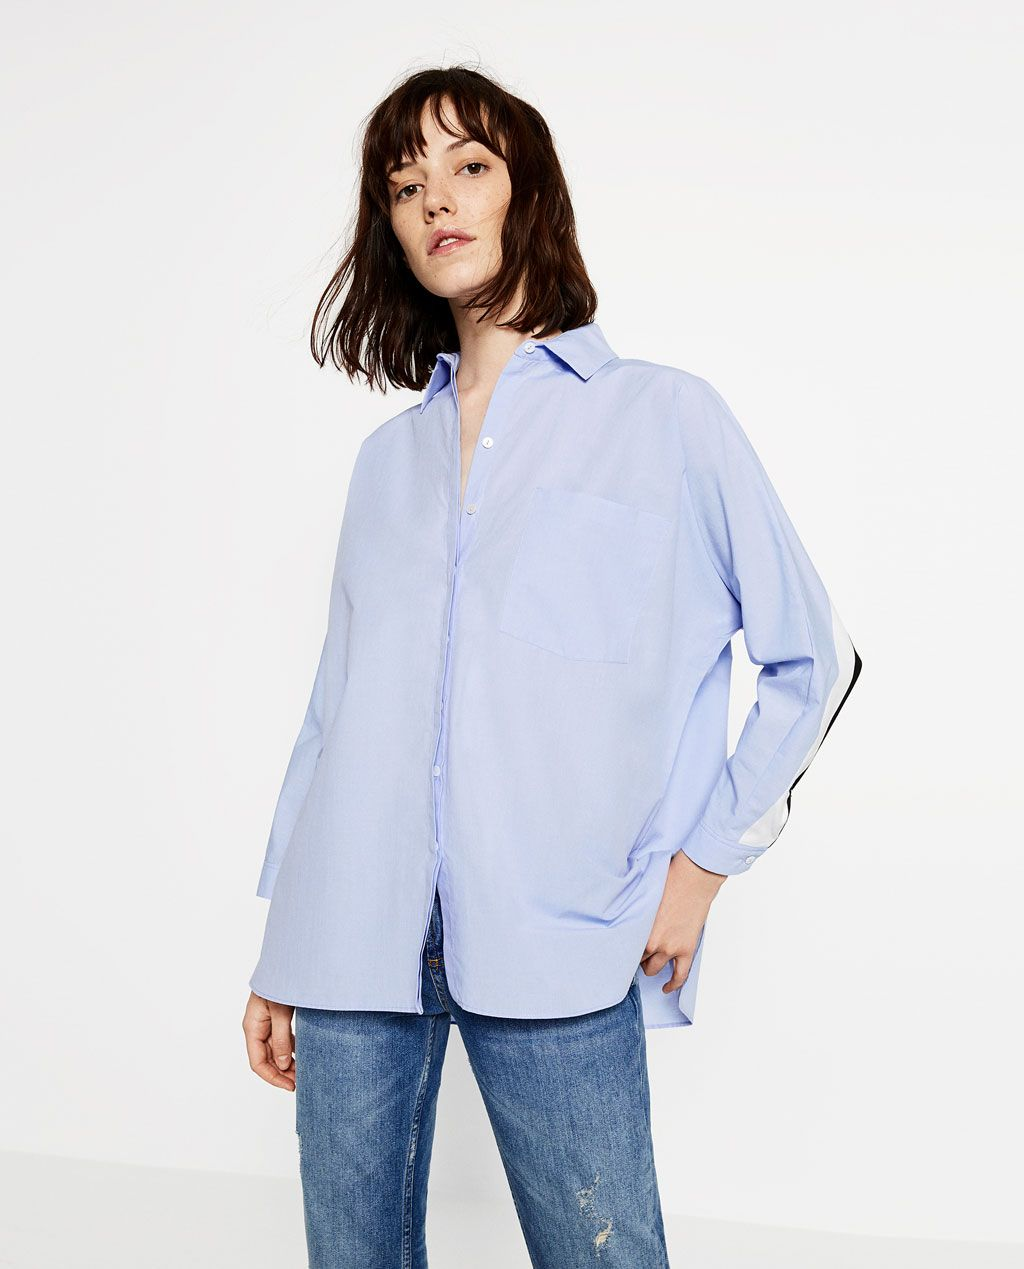 Oversize Zarachemises Blouses Zara Yyfv7b6g Shirtstyle Women Et Amoureux TKc5ul31JF